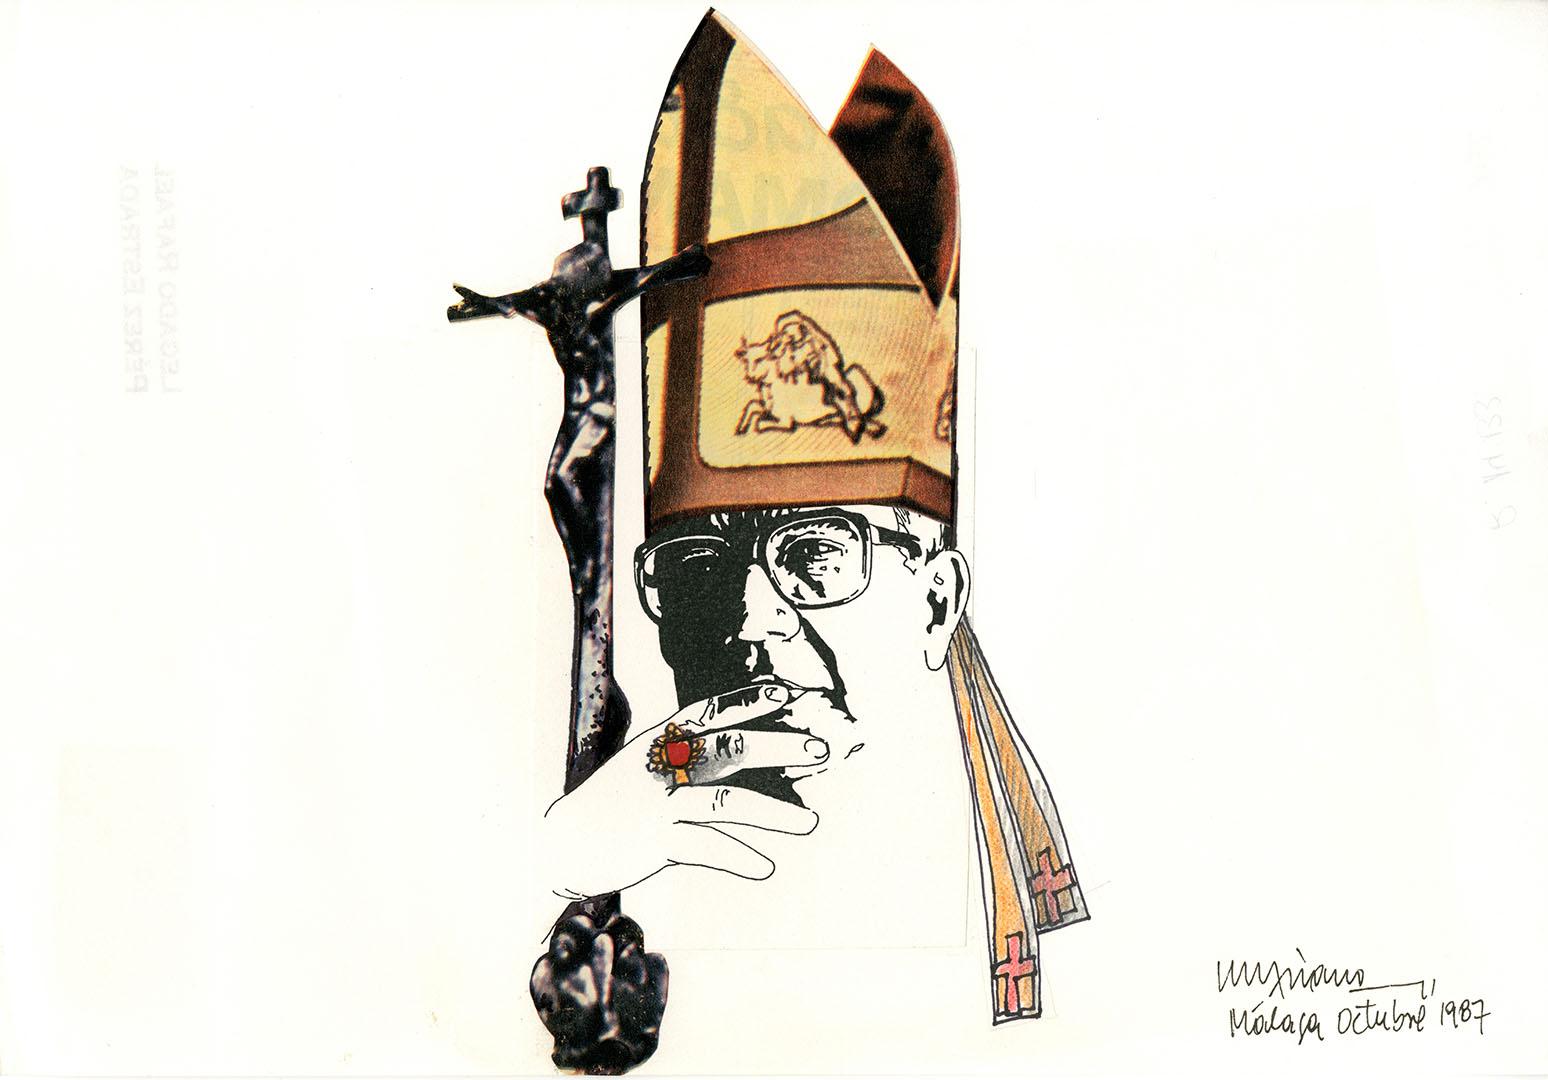 1987 - Retrato de Rafael Pérez Estrada vestido de obispo<div style='clear:both;width:100%;height:0px;'></div><span class='cat'>Dibujos, Drawings</span>